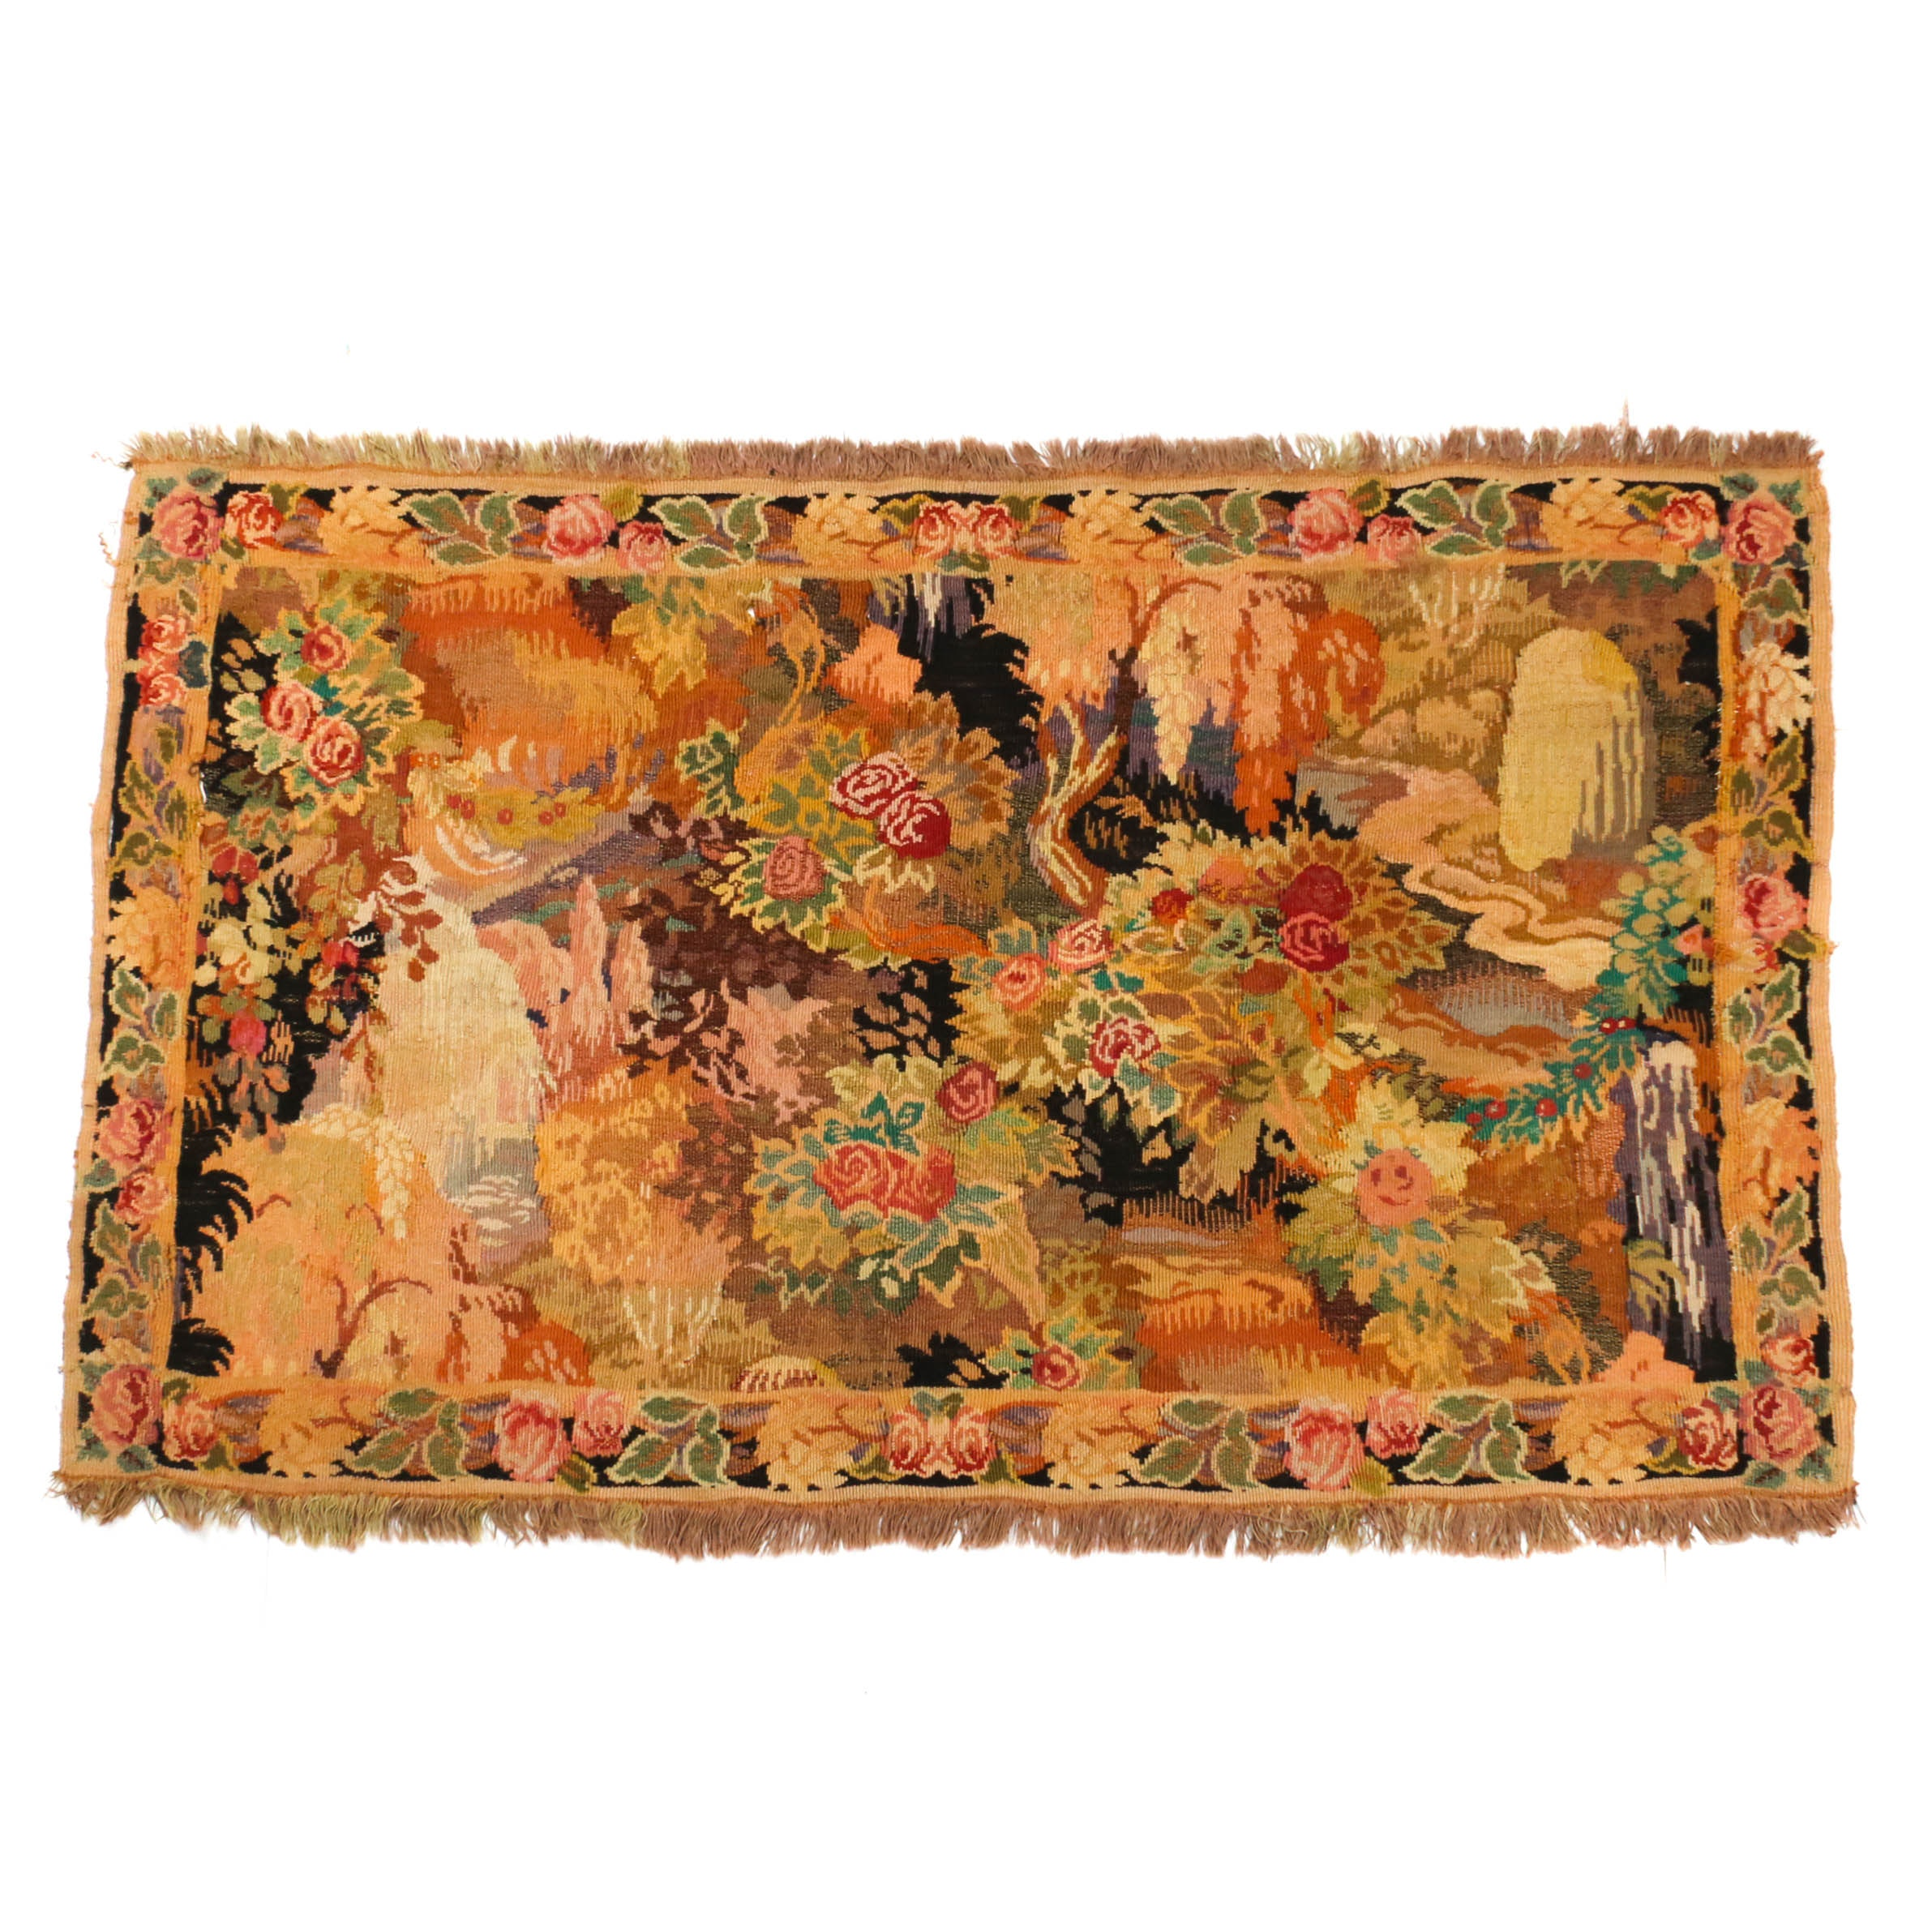 3'7 x 5'4 Handwoven European Floral Tapestry, Circa 1890